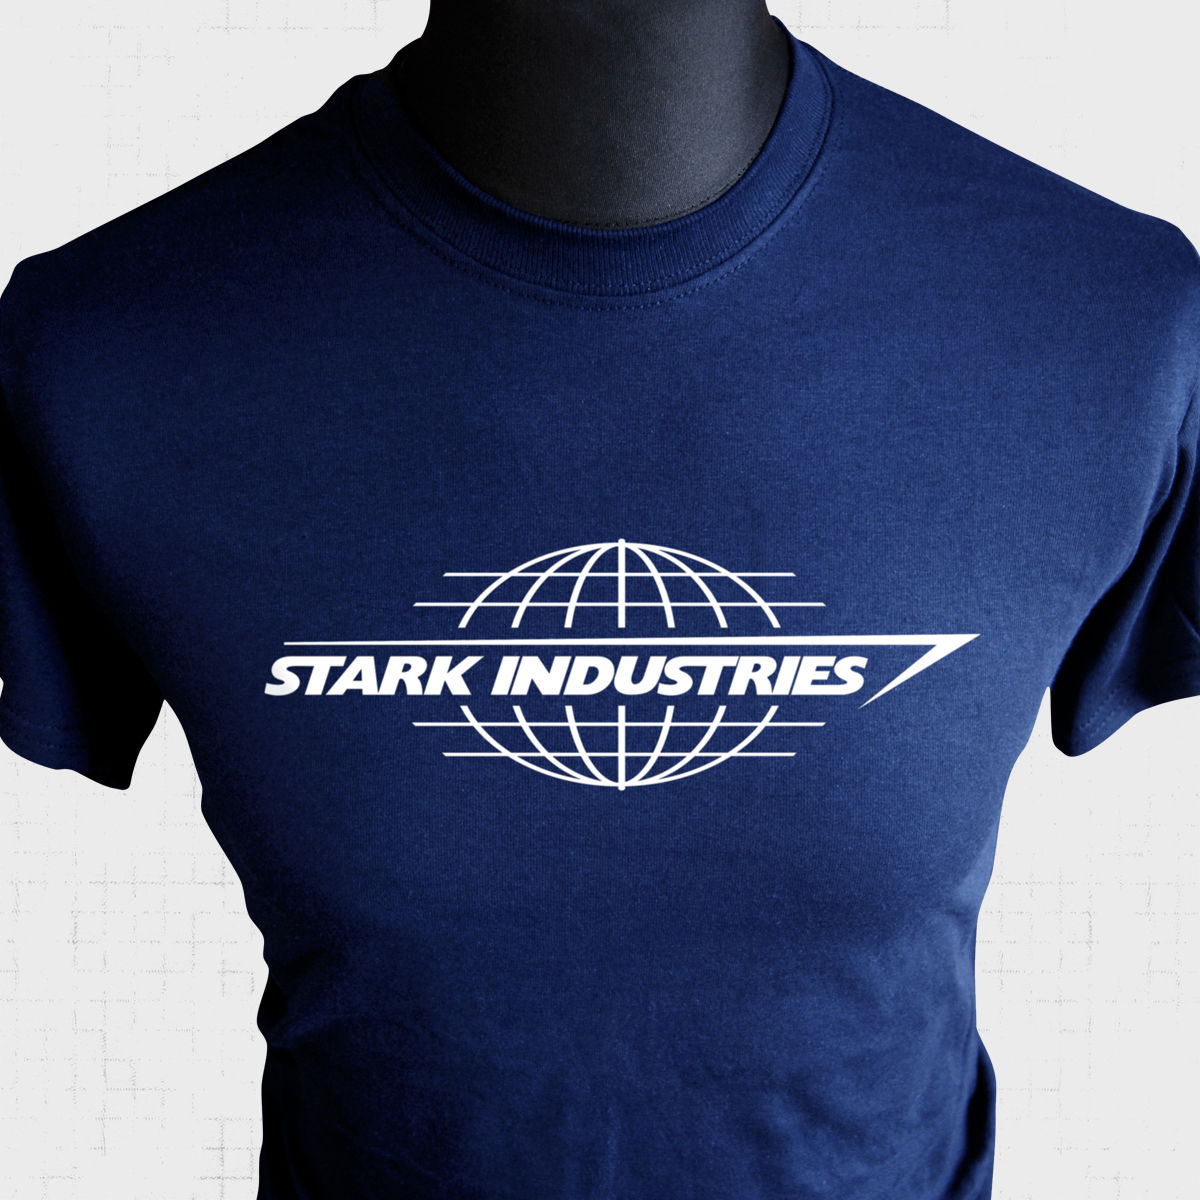 Stark Industries T Shirt Iron Man Tony Avengers Assemble Cool Comic Book Hero Bu in T Shirts from Men 39 s Clothing